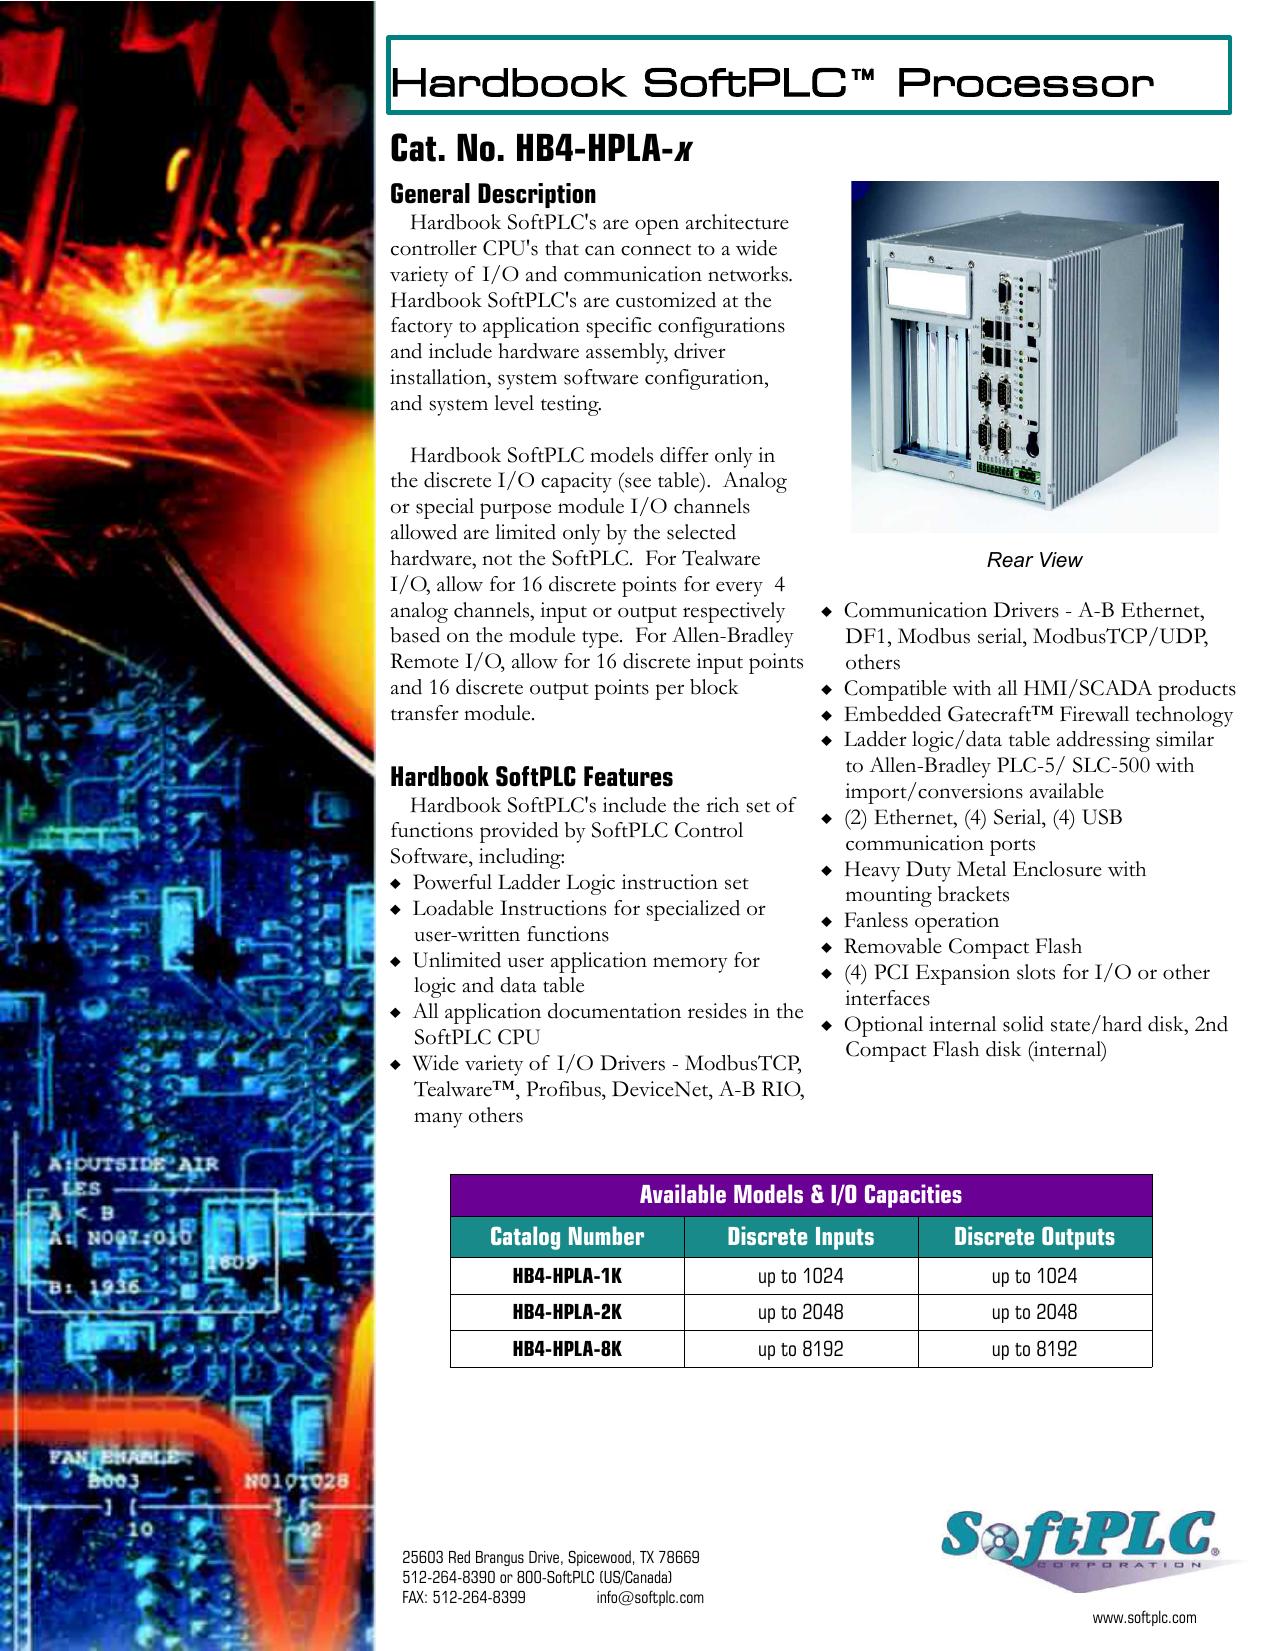 Hardbook SoftPLC™ Processor Cat  No  HB4-HPLA-x | manualzz com